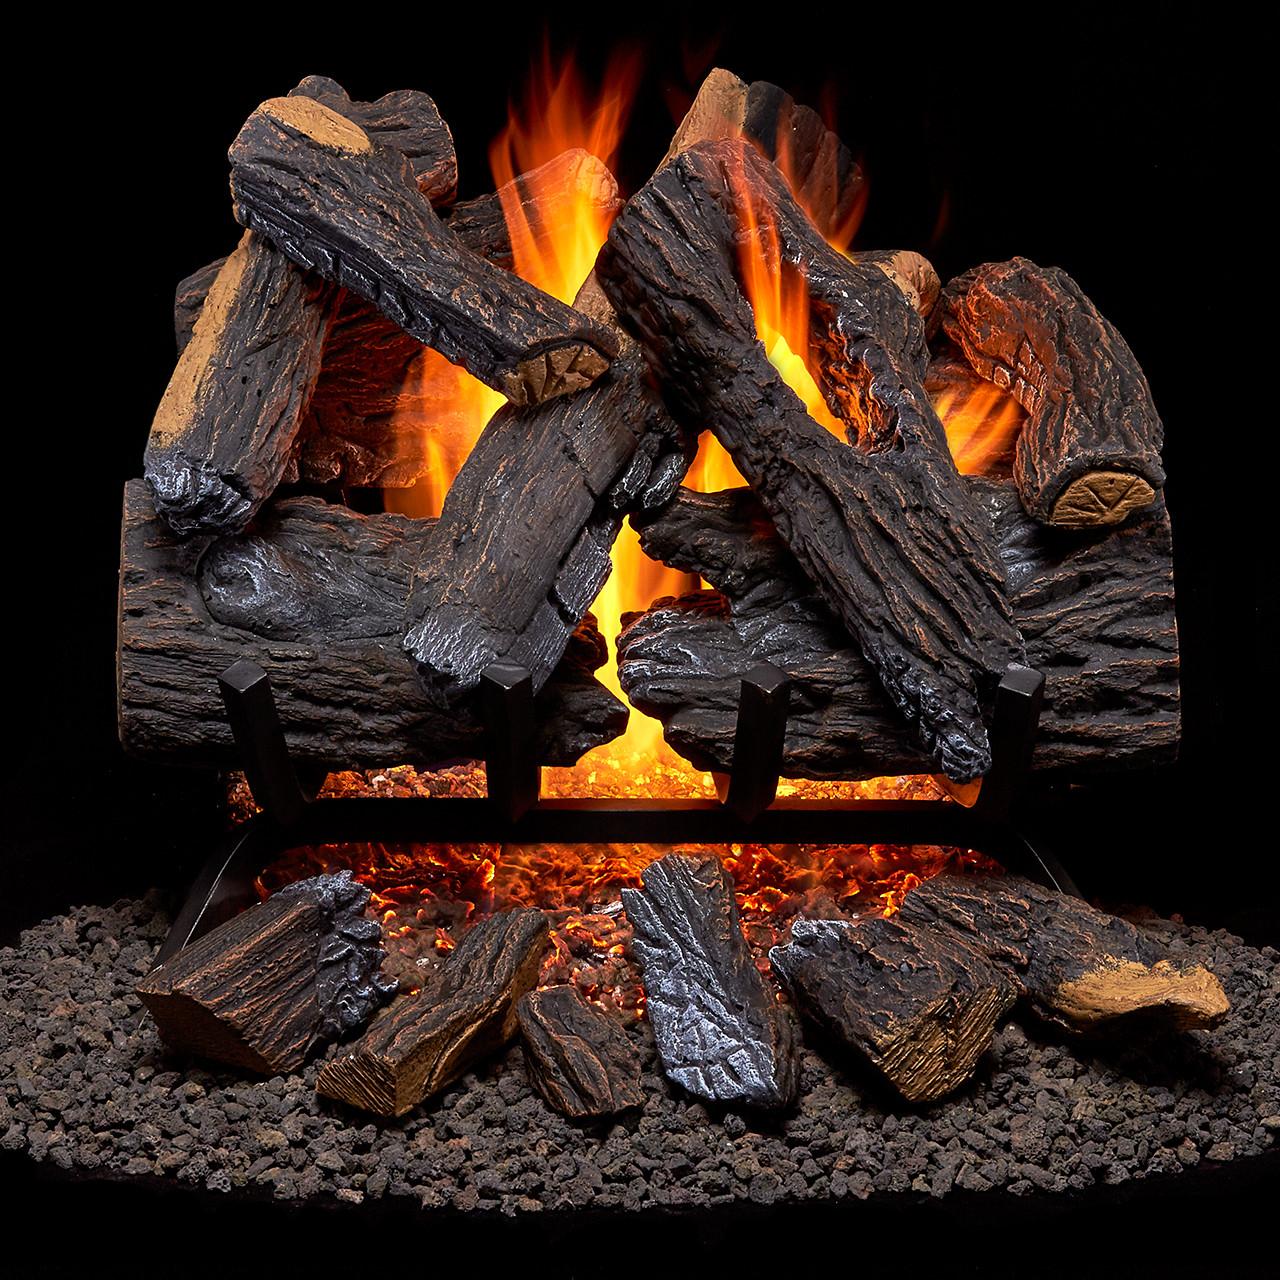 Duluth Forge Vented Natural Gas Fireplace Log Set with Ember Log Kit - Gas Log , Gas Log Sets, Fireplace Log Sets - Factory Buys Direct